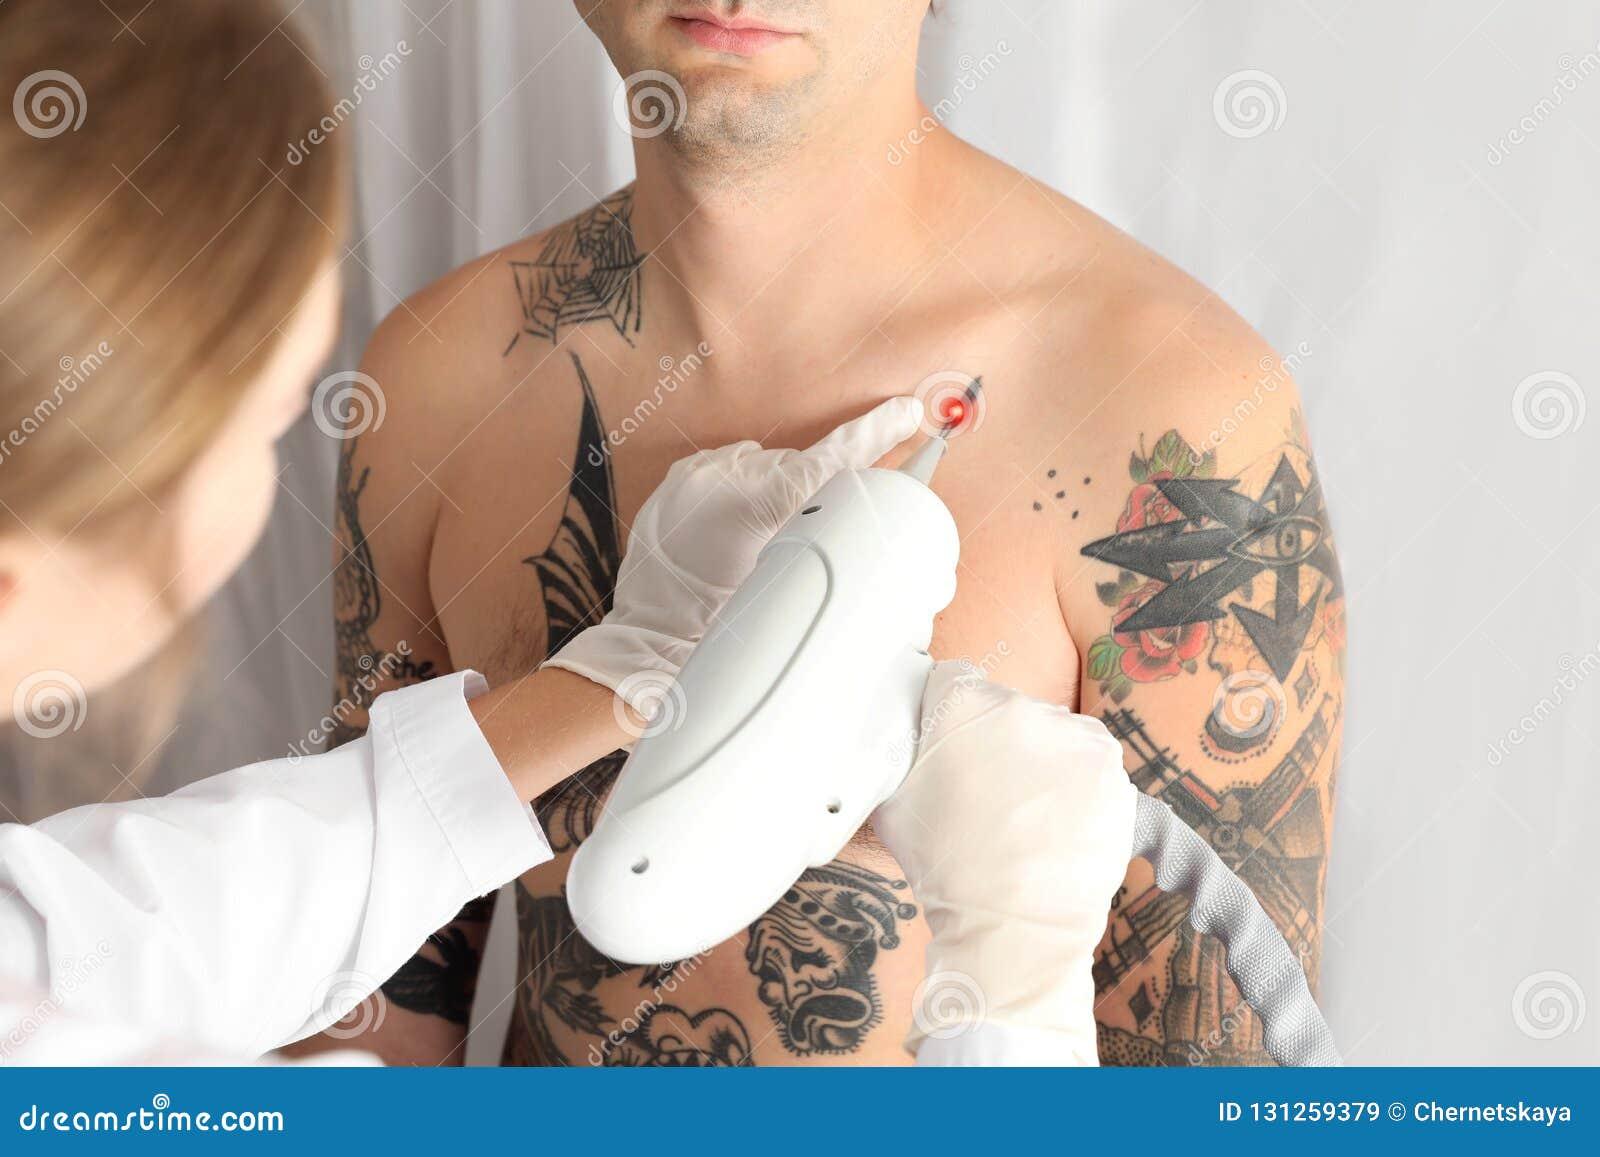 Man Undergoing Laser Tattoo Removal Procedure Stock Image